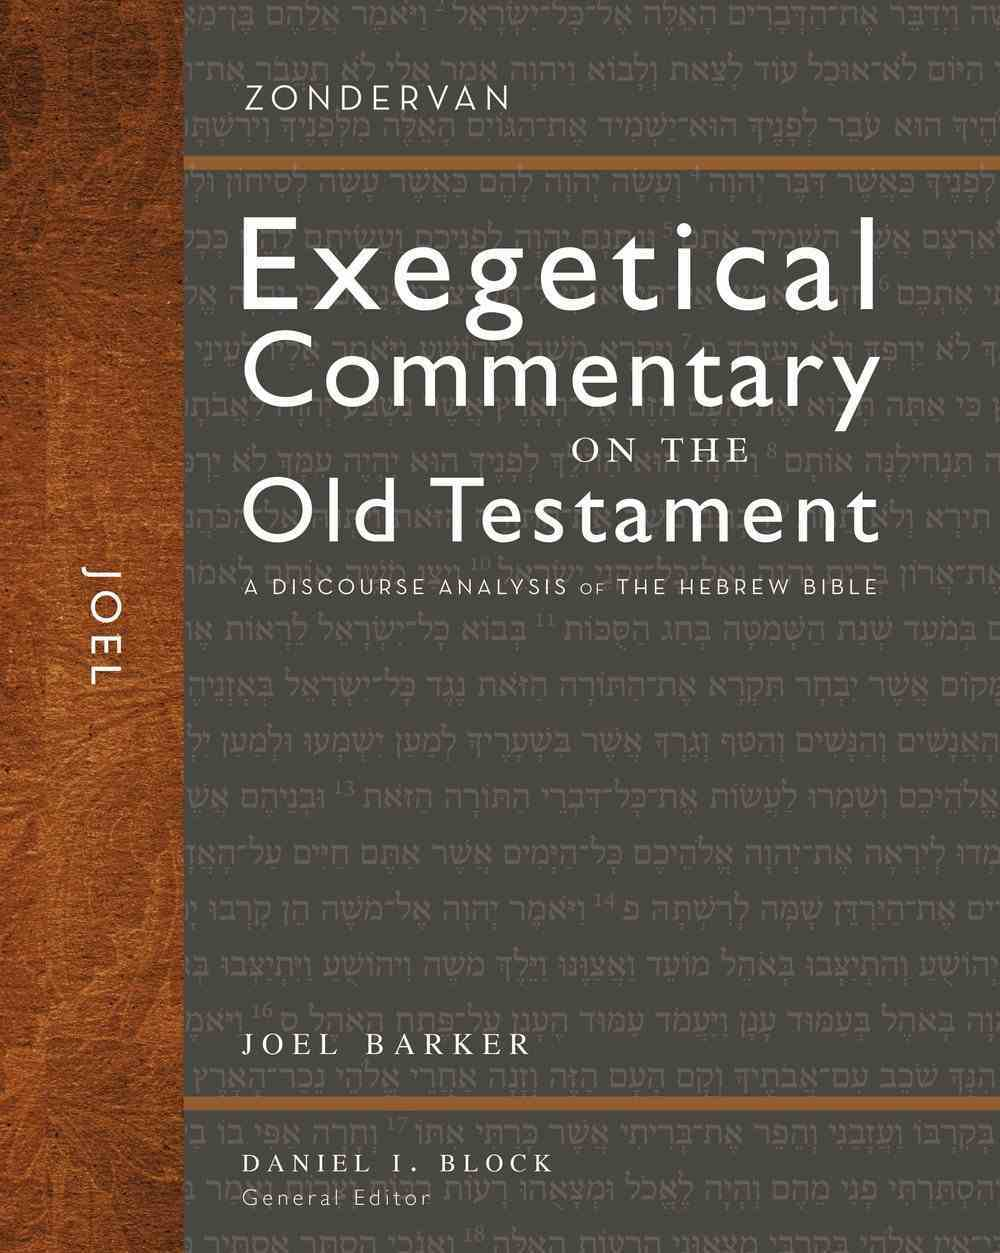 Joel (Zondervan Exegetical Commentary On The Old Testament Series) Hardback